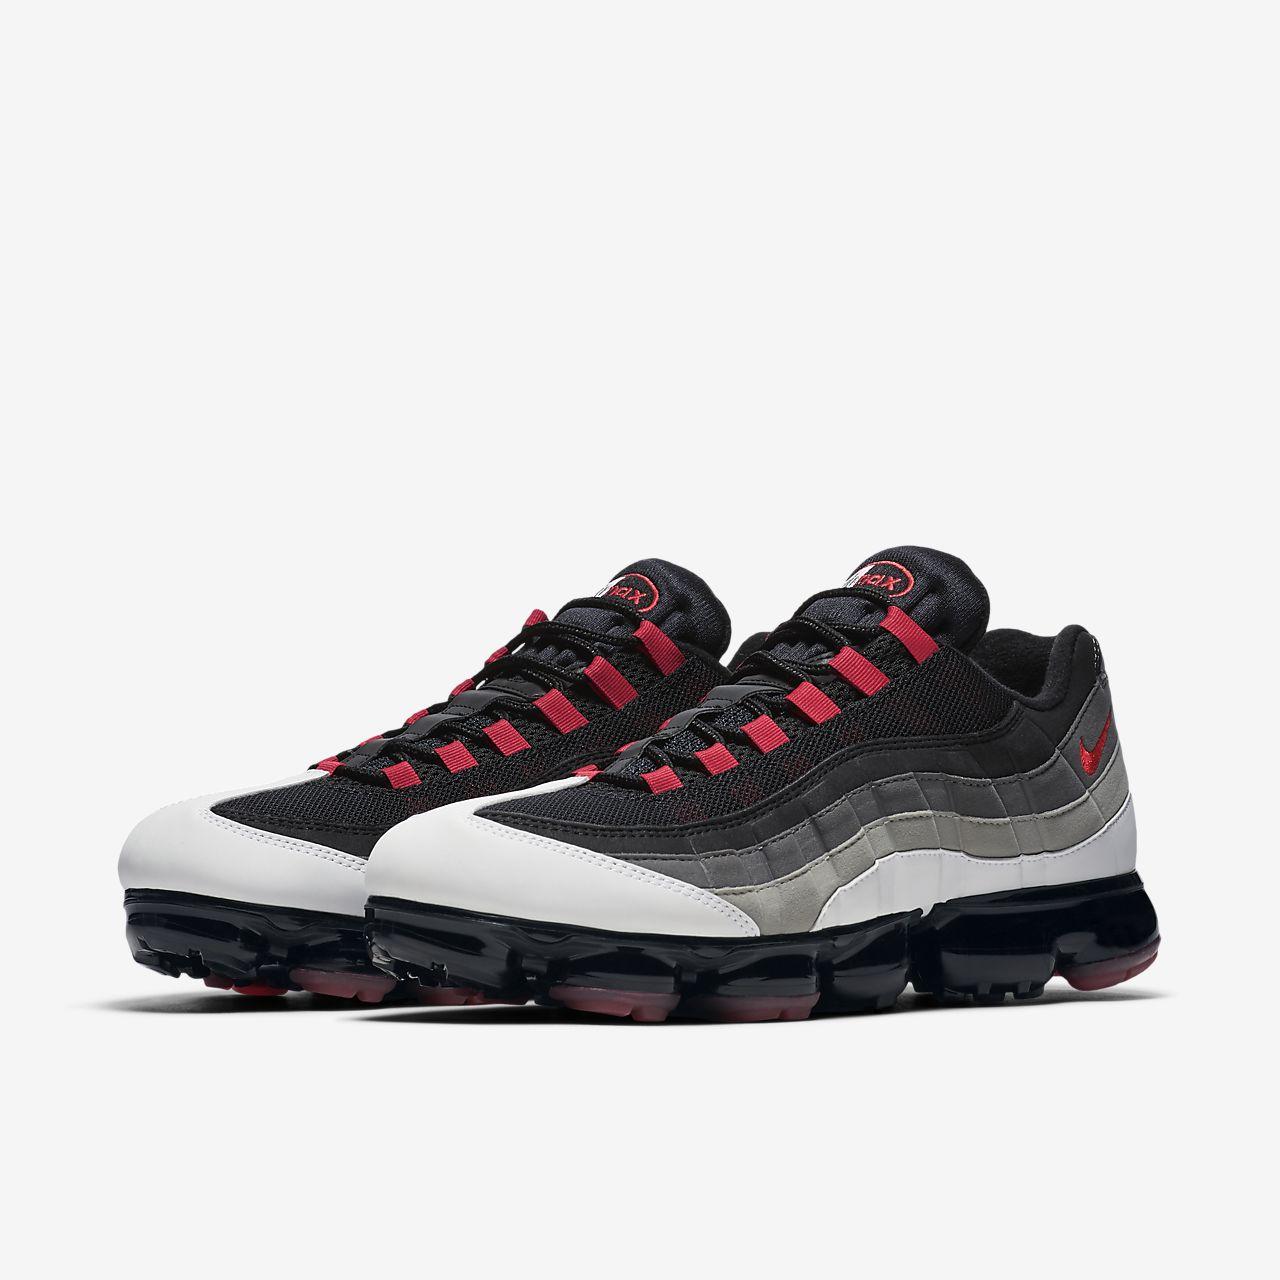 a2edf86e9ba Nike Air VaporMax 95 Men s Shoe. Nike.com